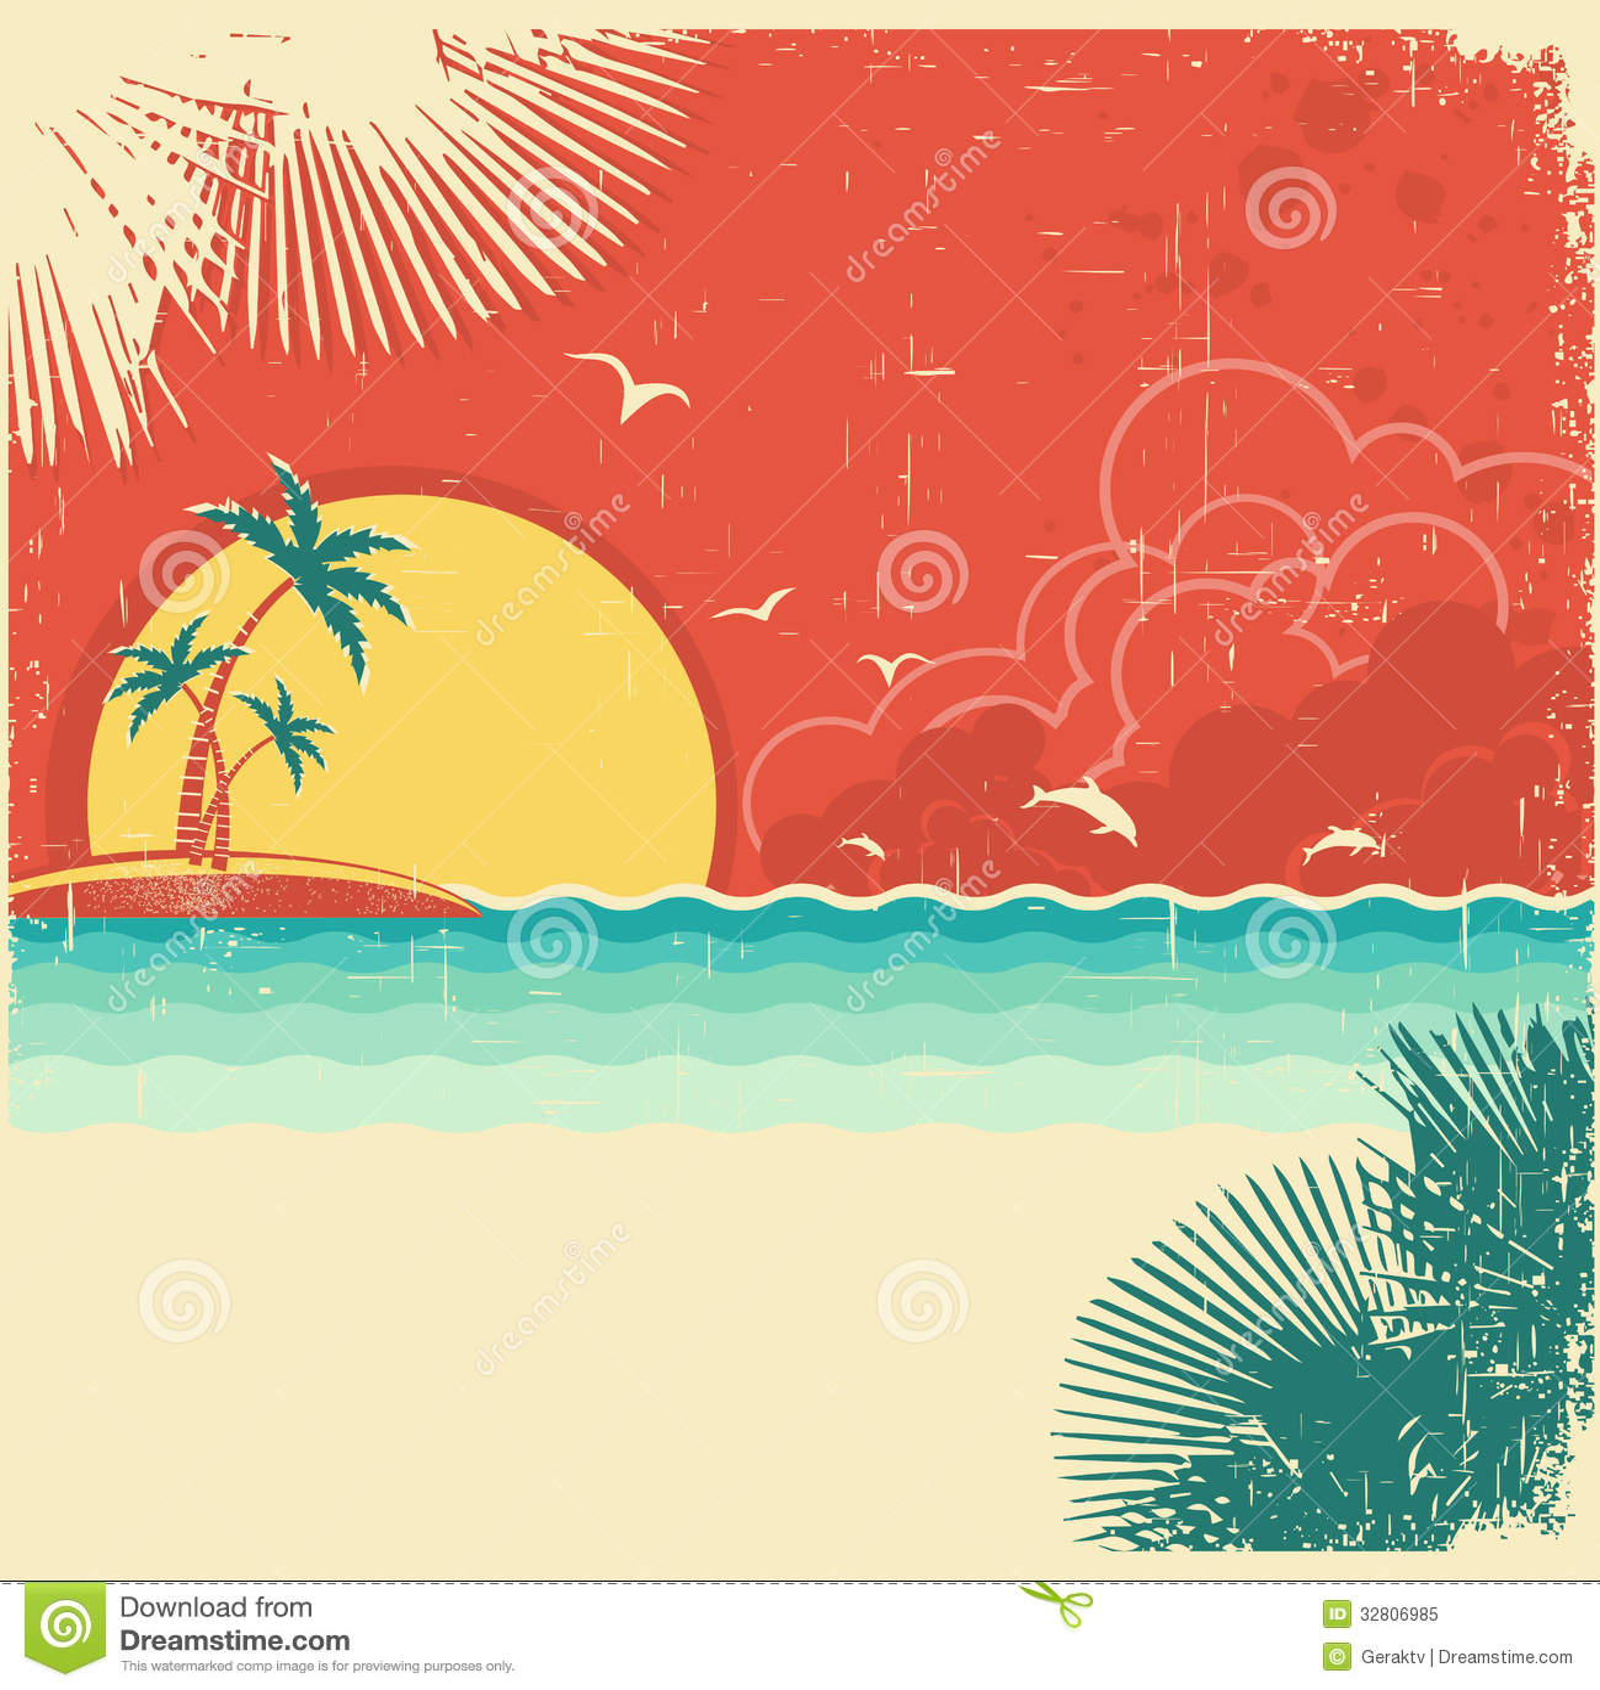 Retro Beach Illustration Royalty Free Stock Photo: Vintage Nature Tropical Seascape Background Stock Vector